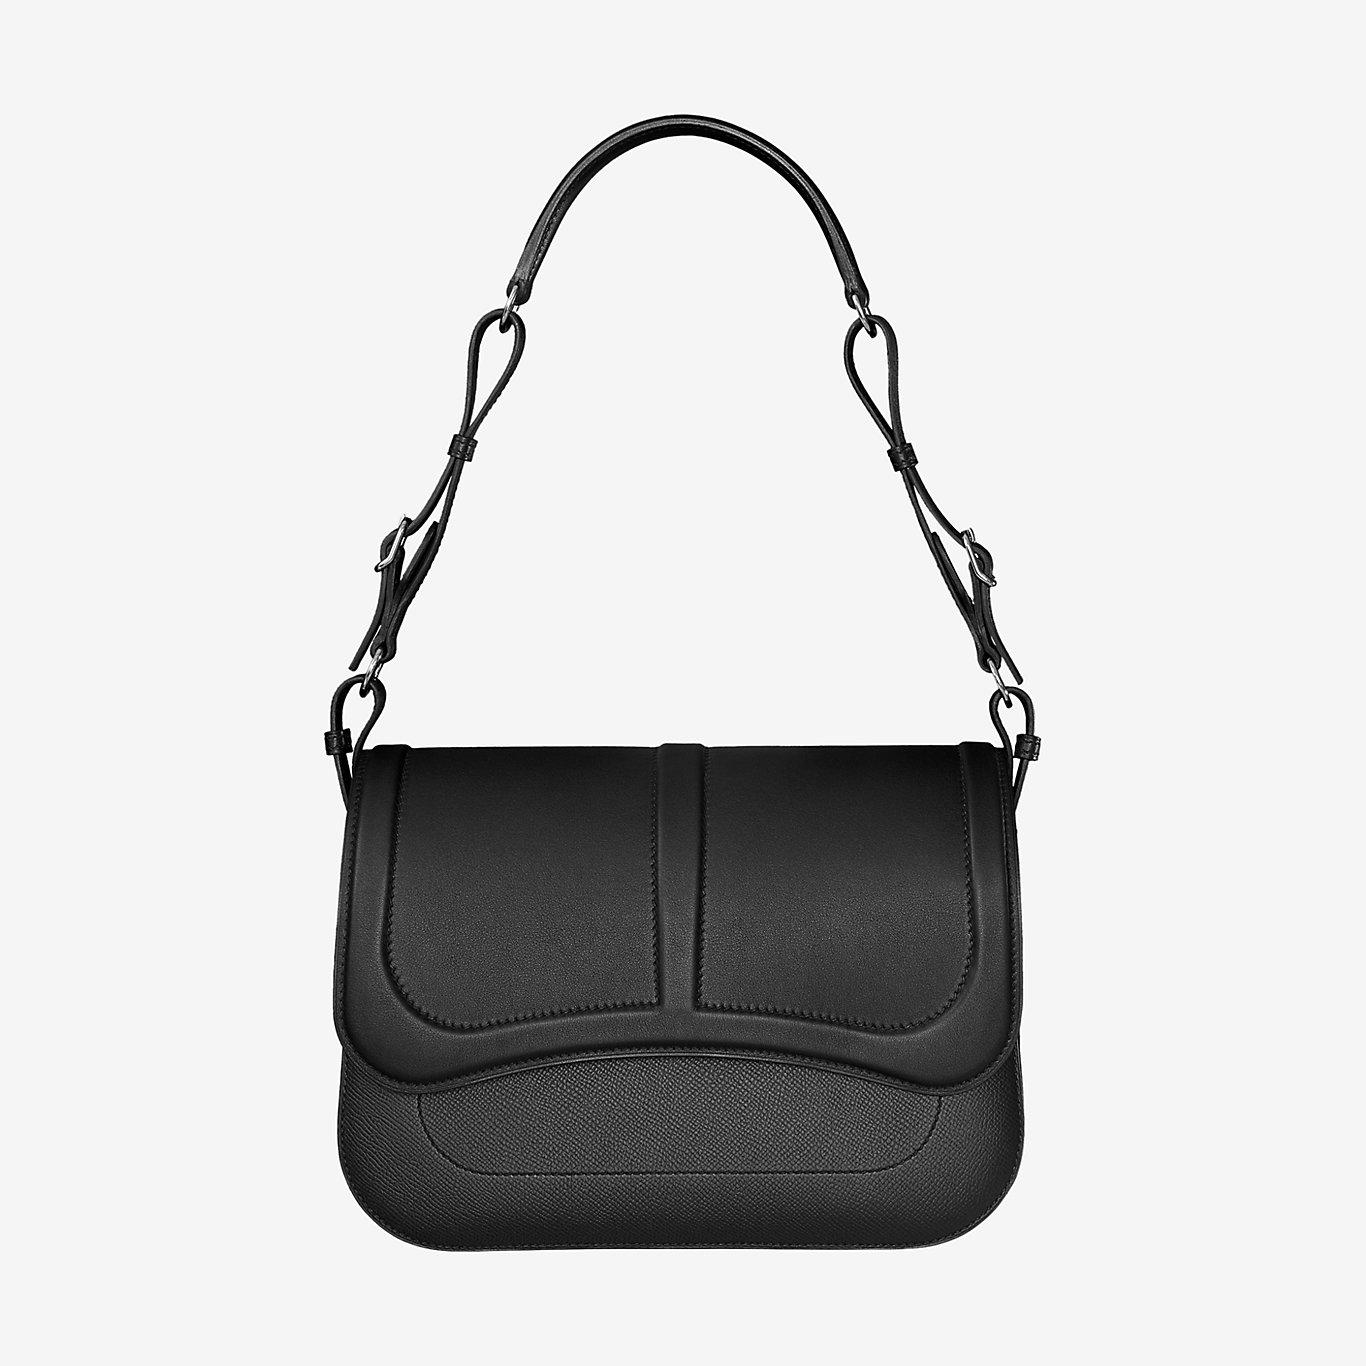 Harnais bag, medium model - front